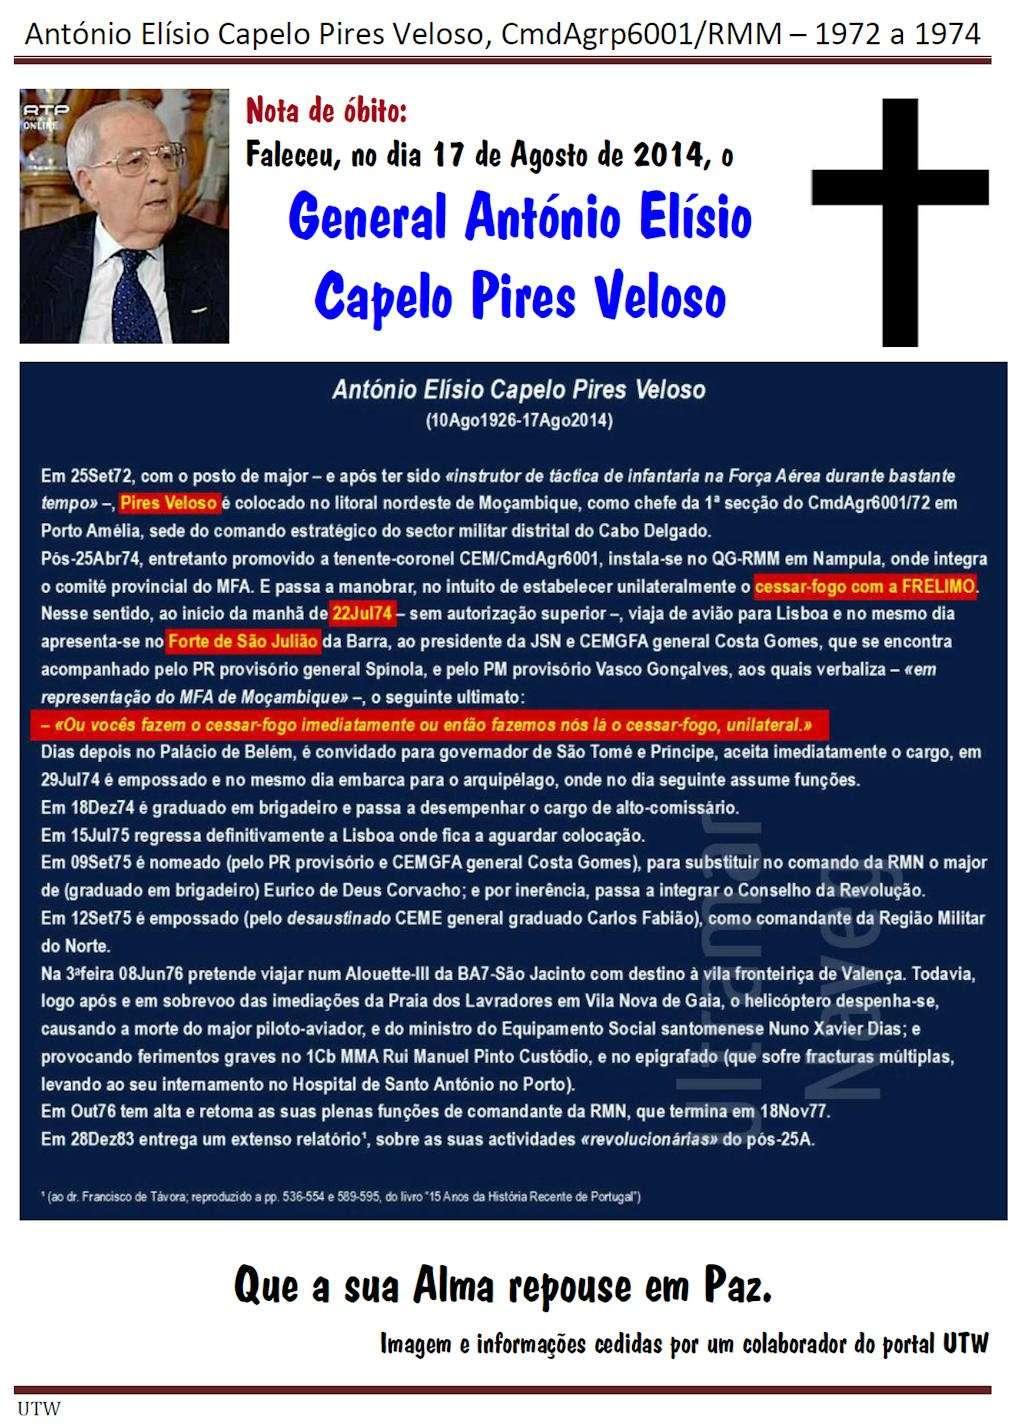 Faleceu o General António Elísio Capelo Pires Veloso - CmdAgrp6001 - 17Ago2014 Antoni11